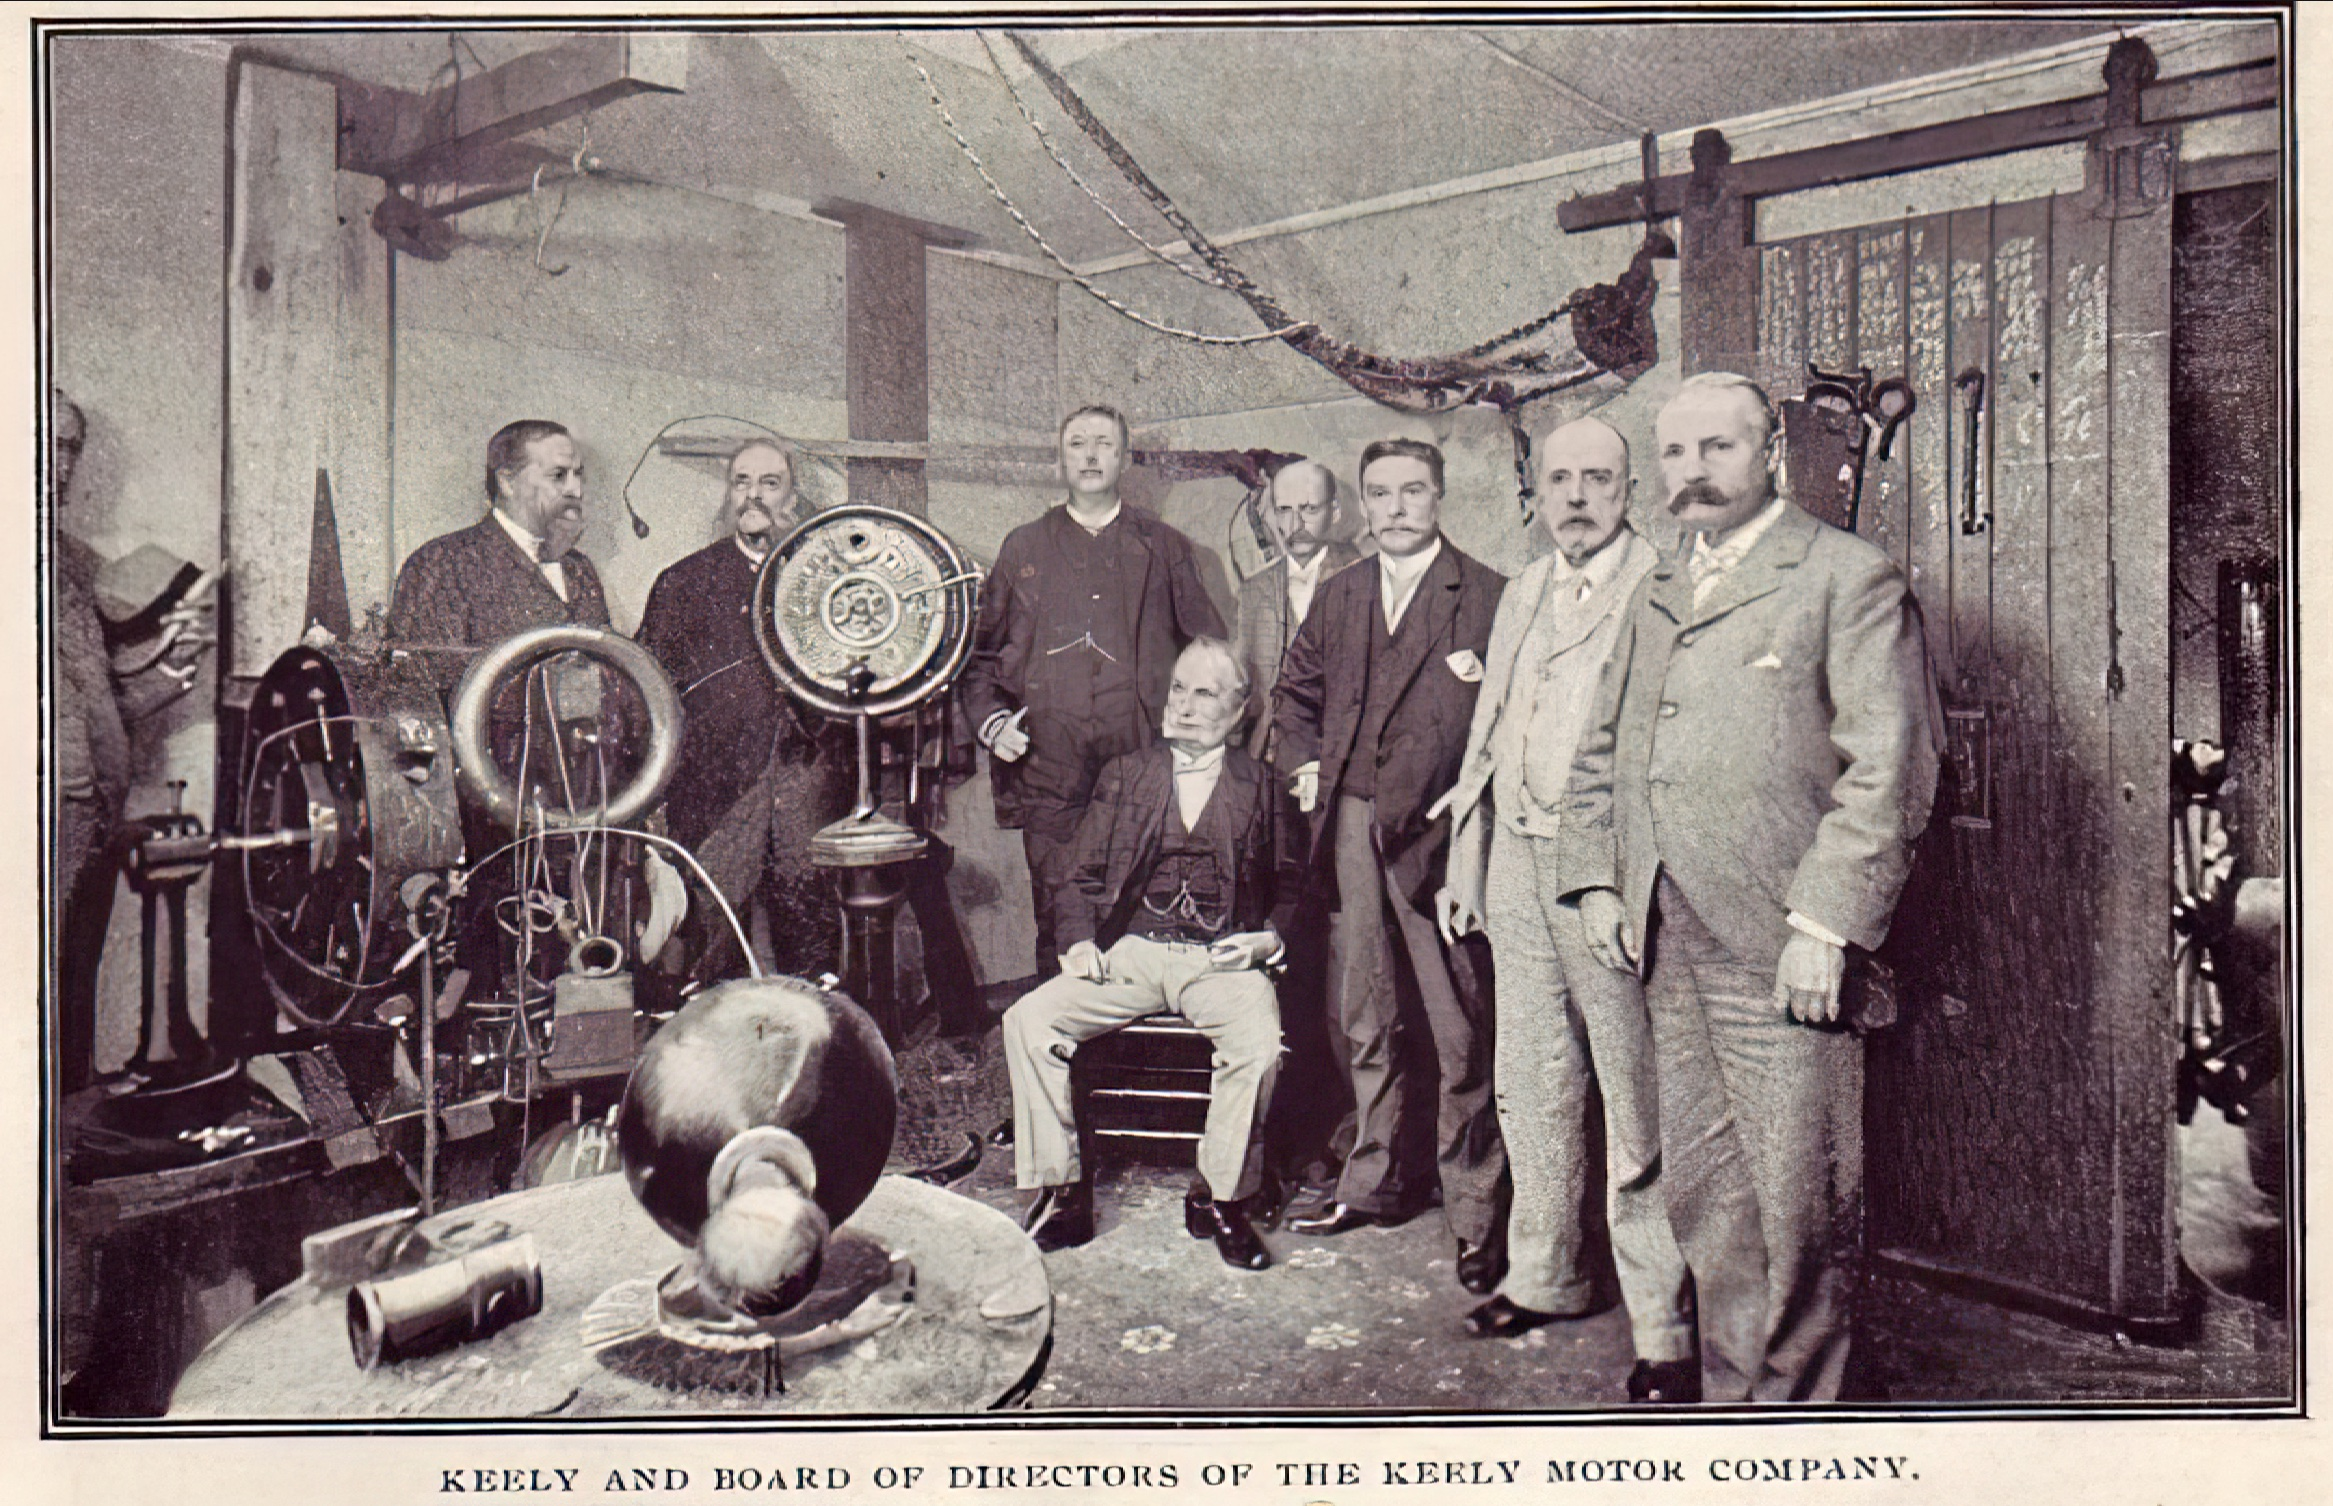 Keely Motor Company Board of Directors